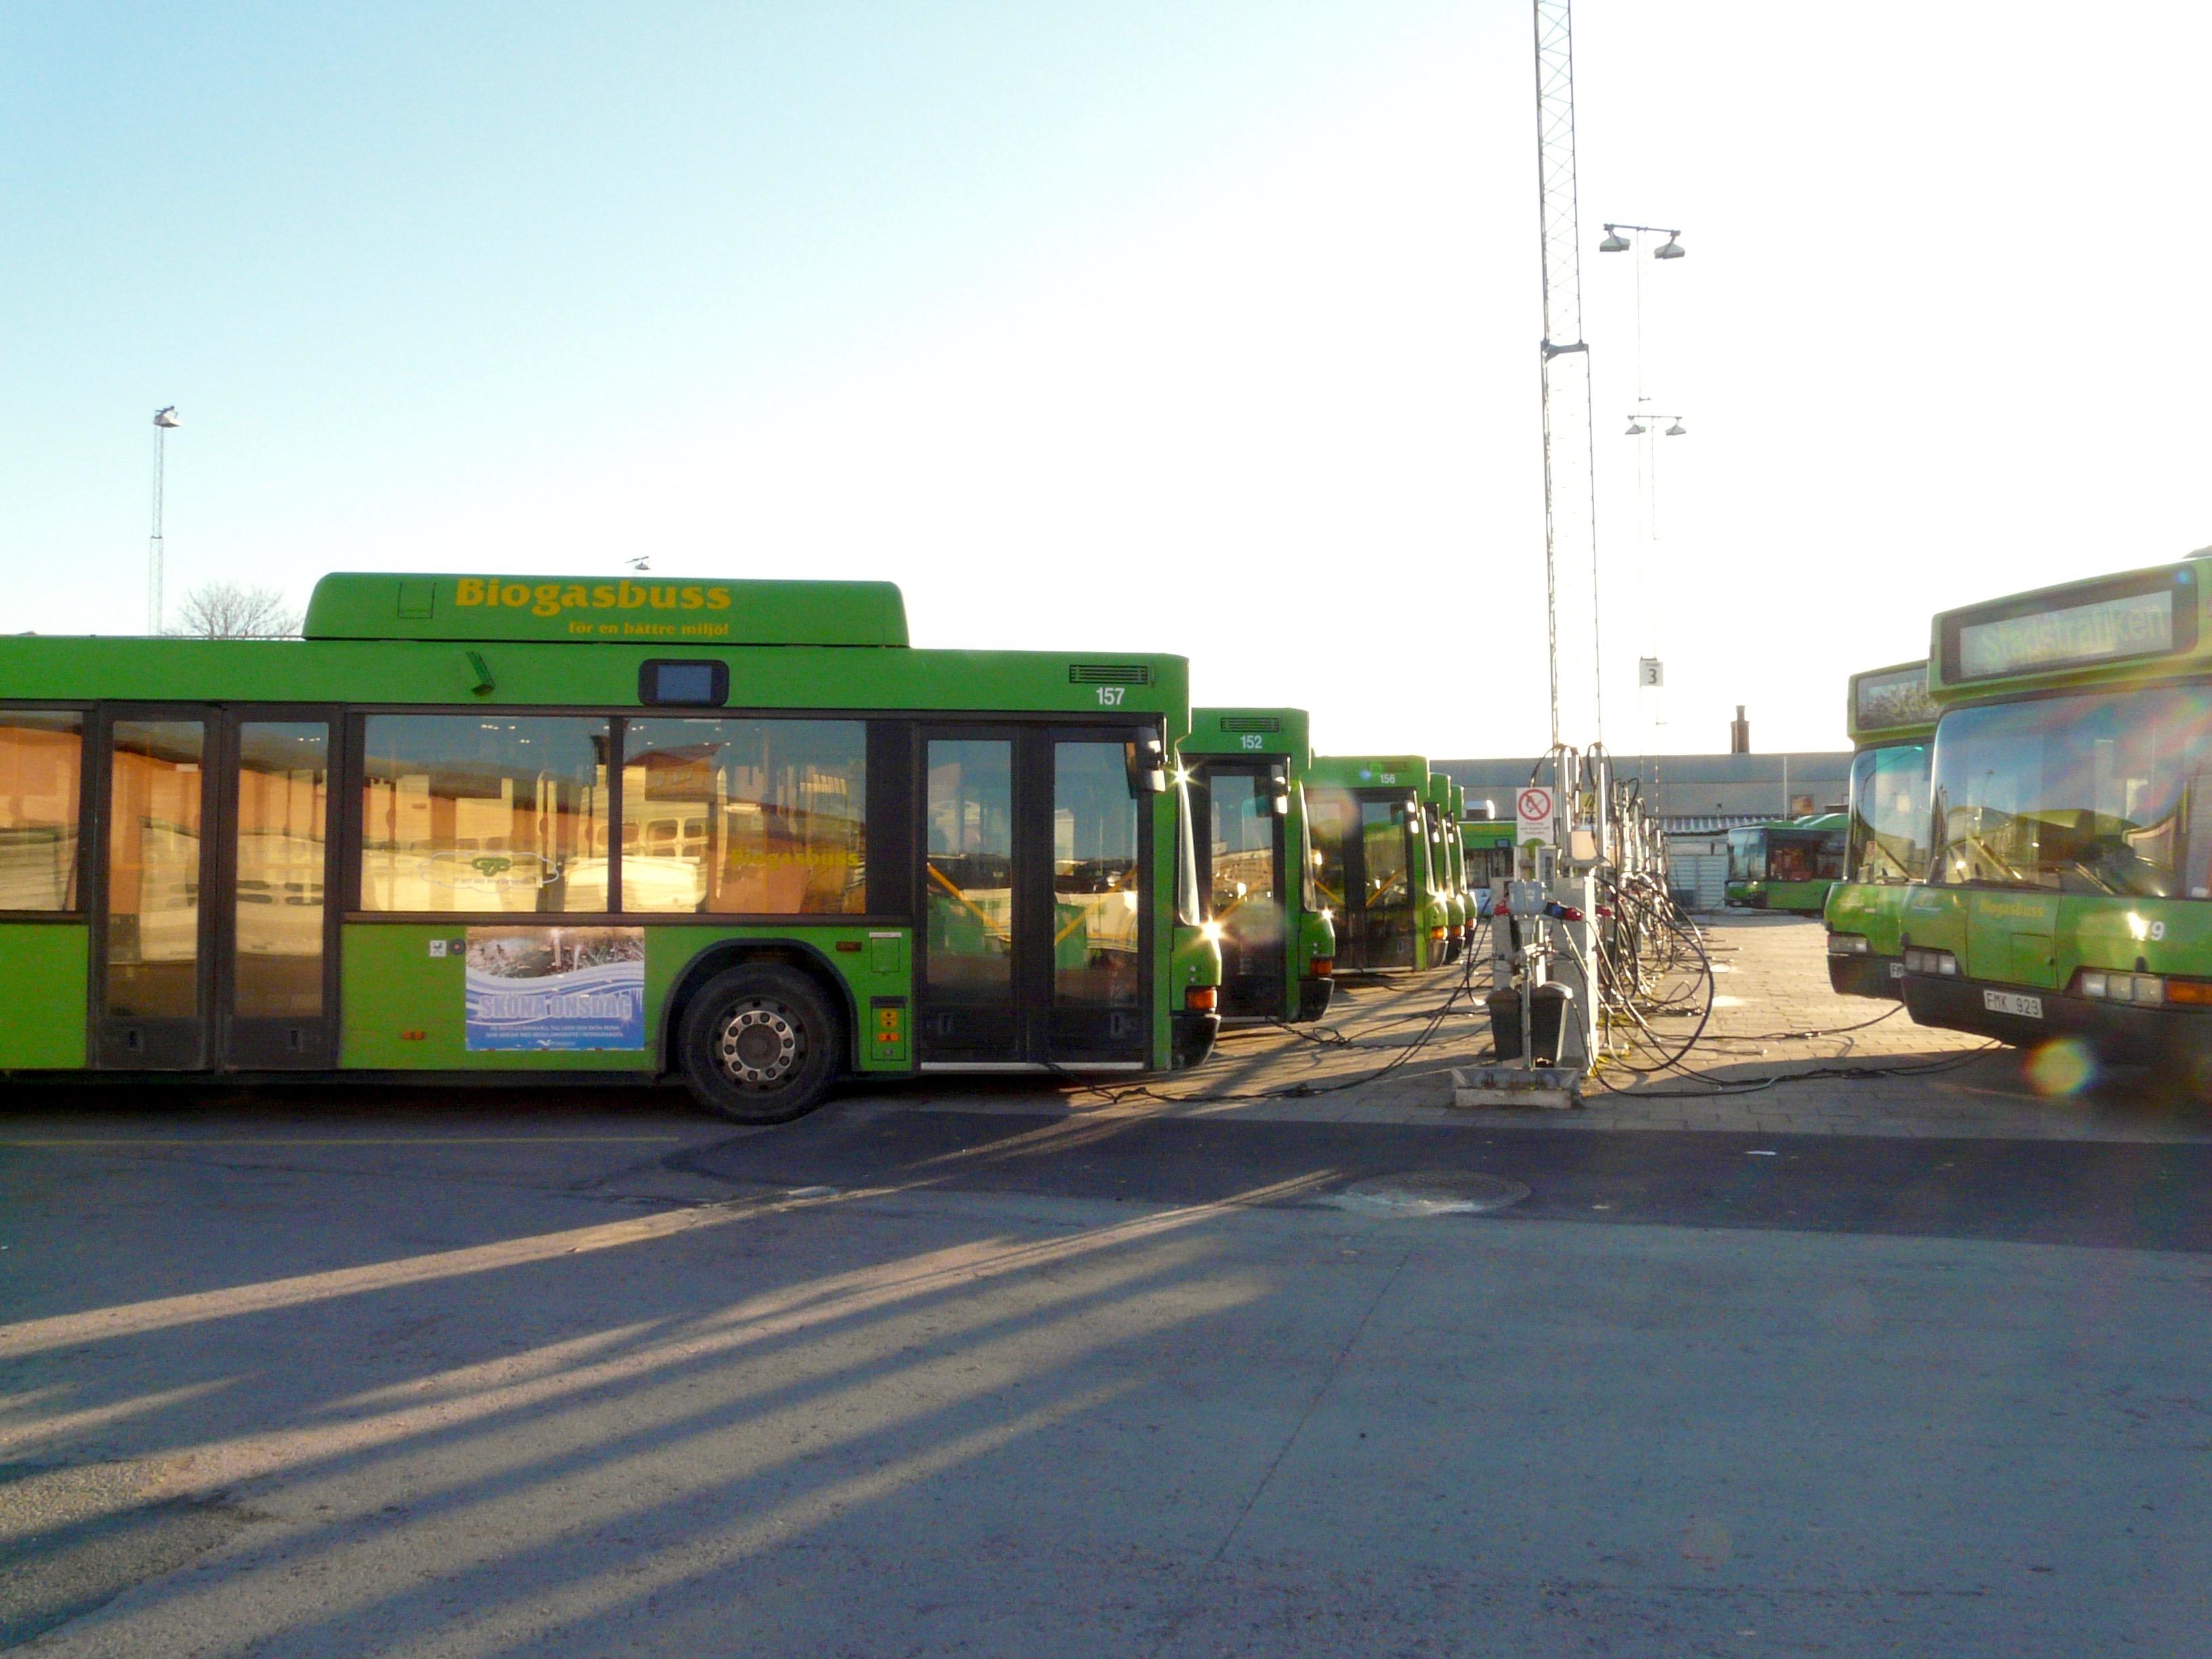 Biogasbussar